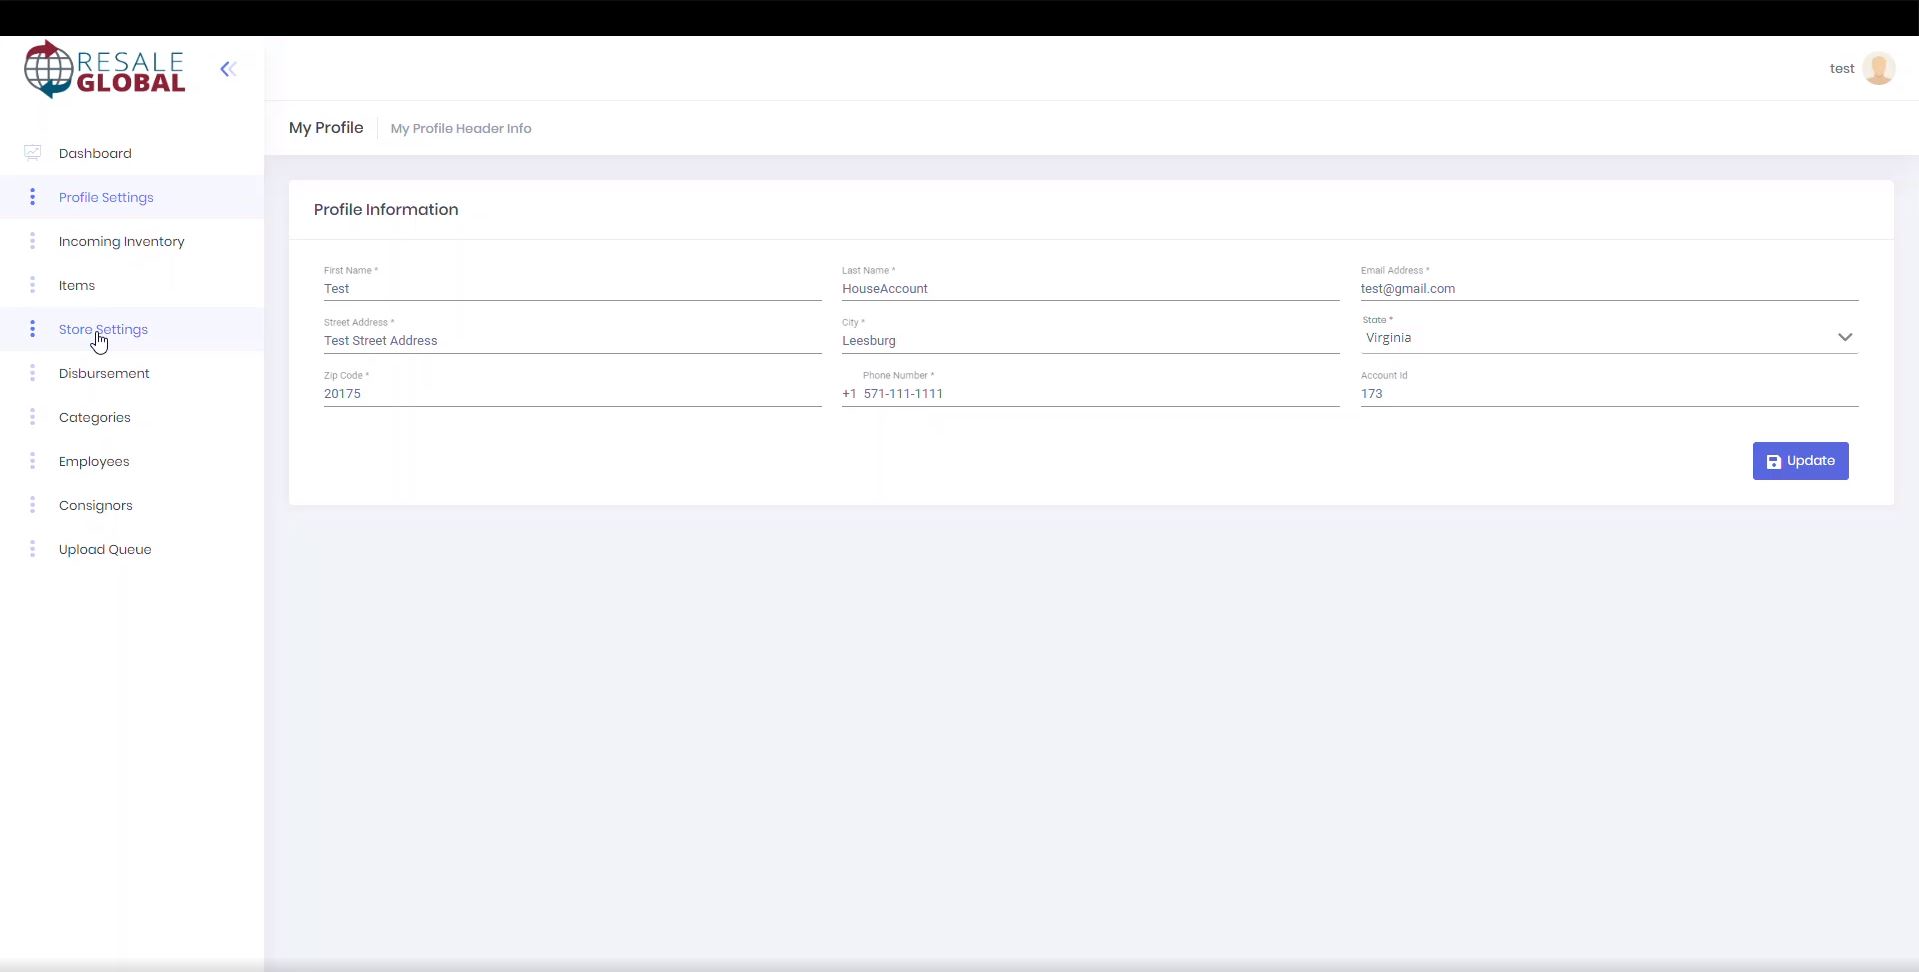 Resale Global profile configuration